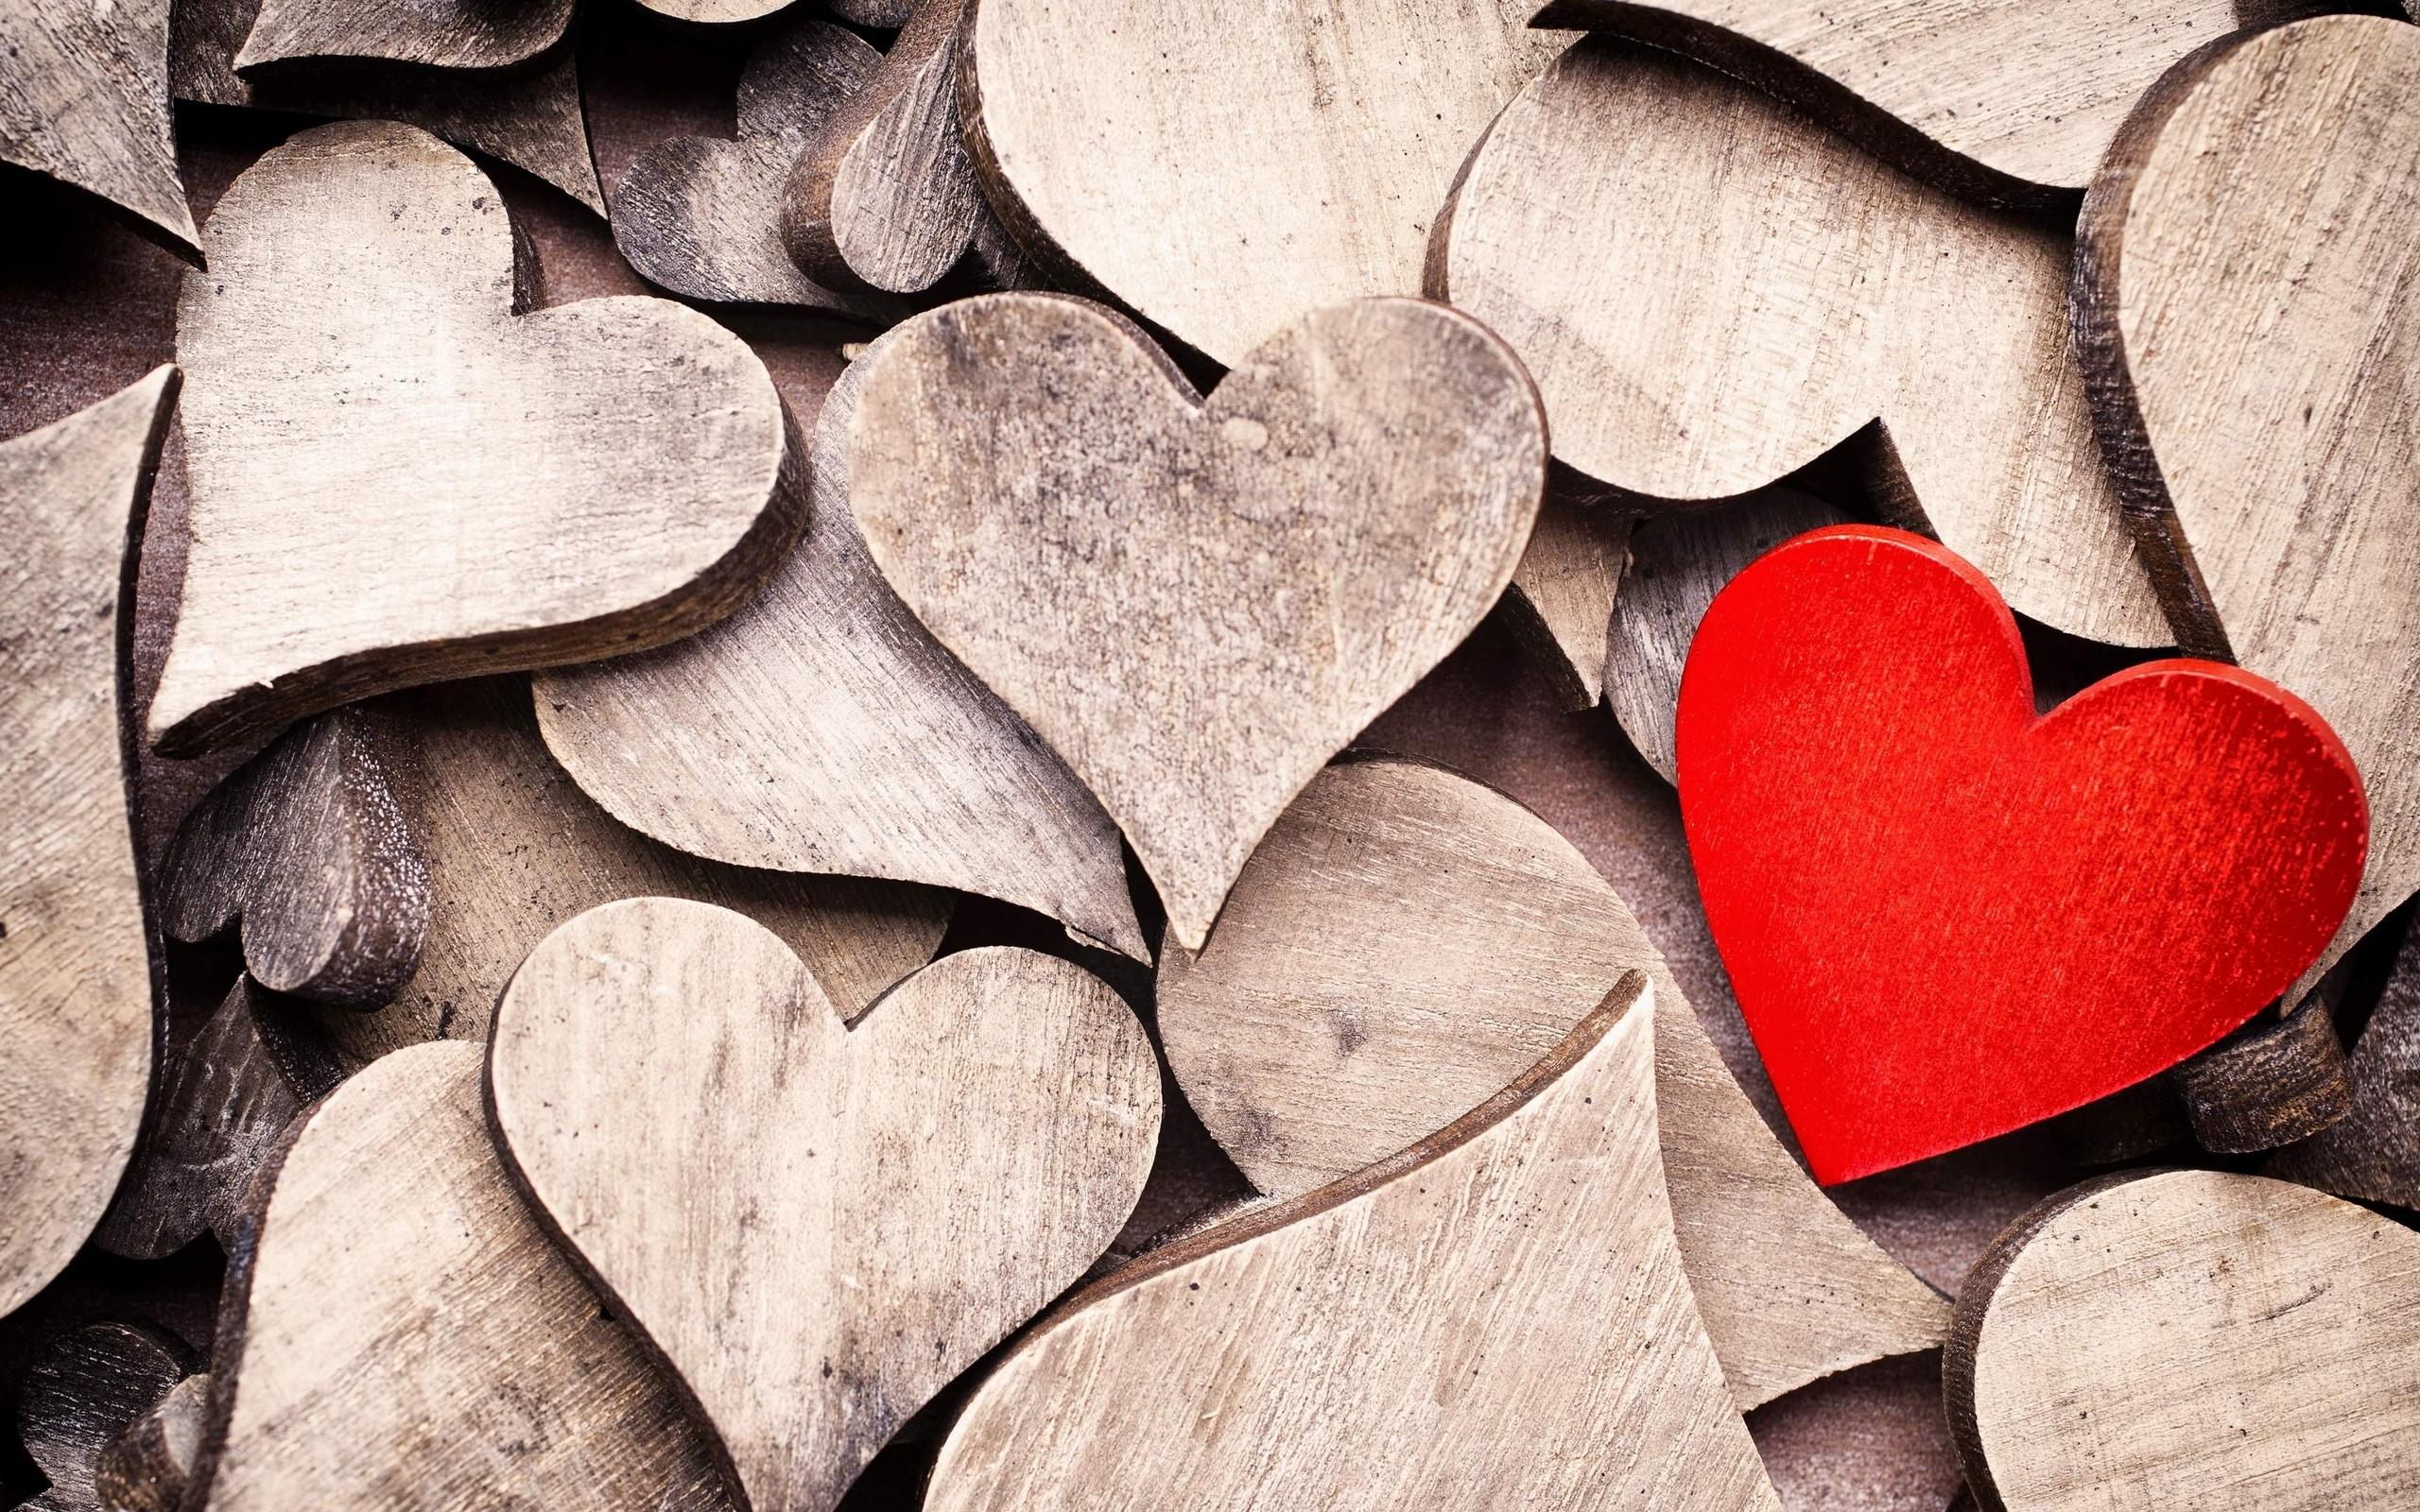 2560x1600, 4k Wallpaper, Hearts Wallpaper, Little Hearts, - Talk To The Heart - HD Wallpaper